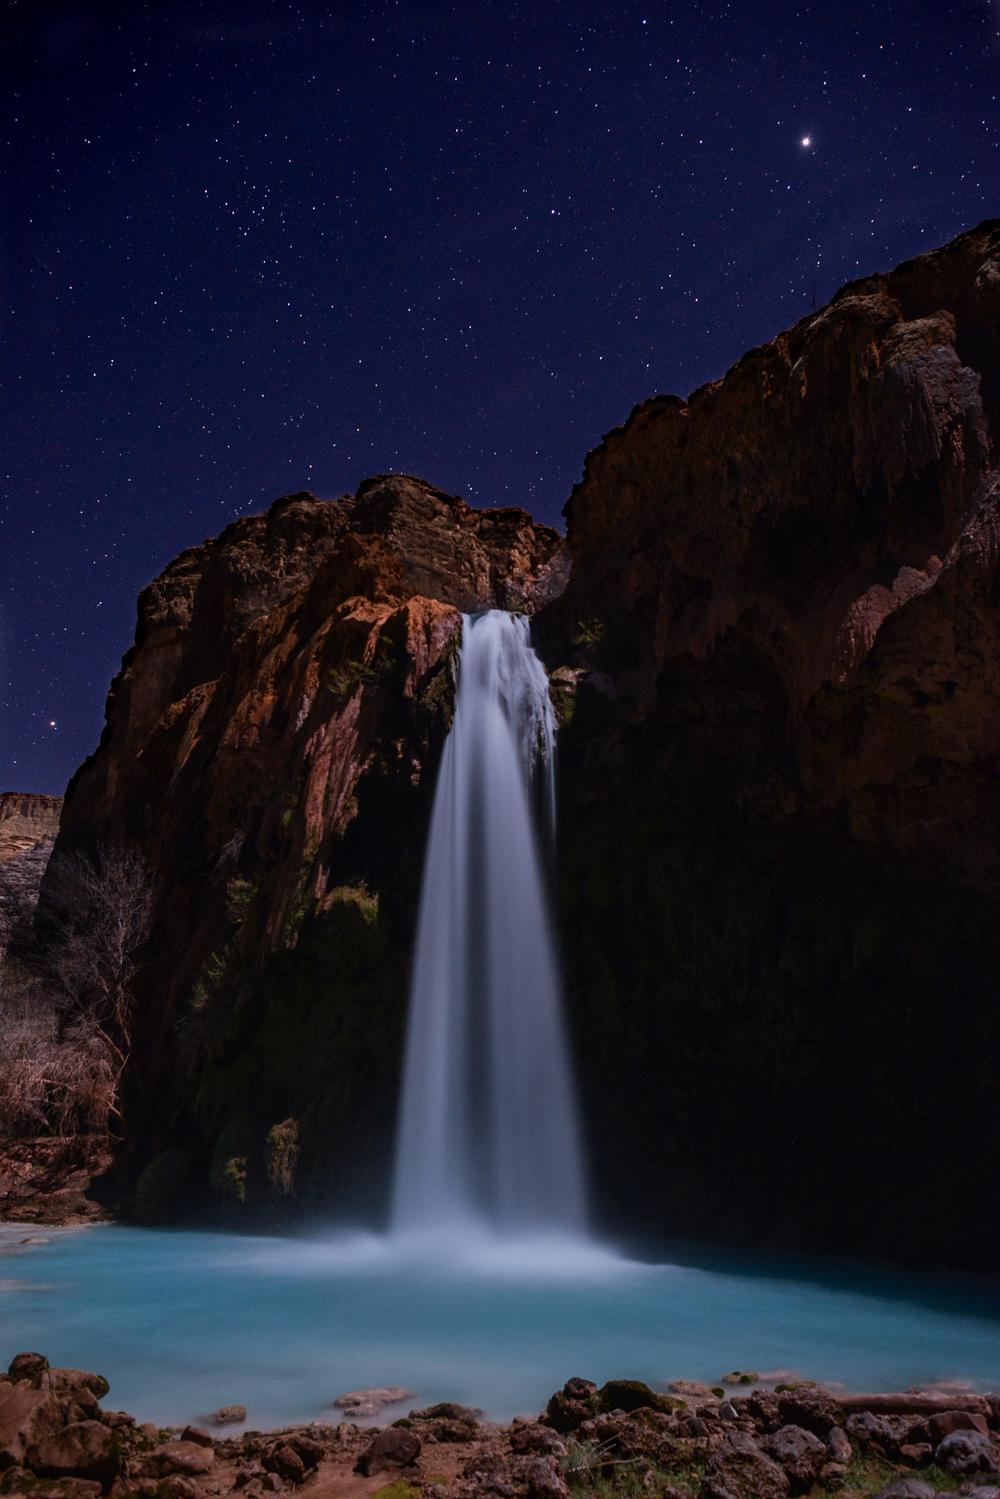 havasu falls glows in the moonlight - photo by jesse weber